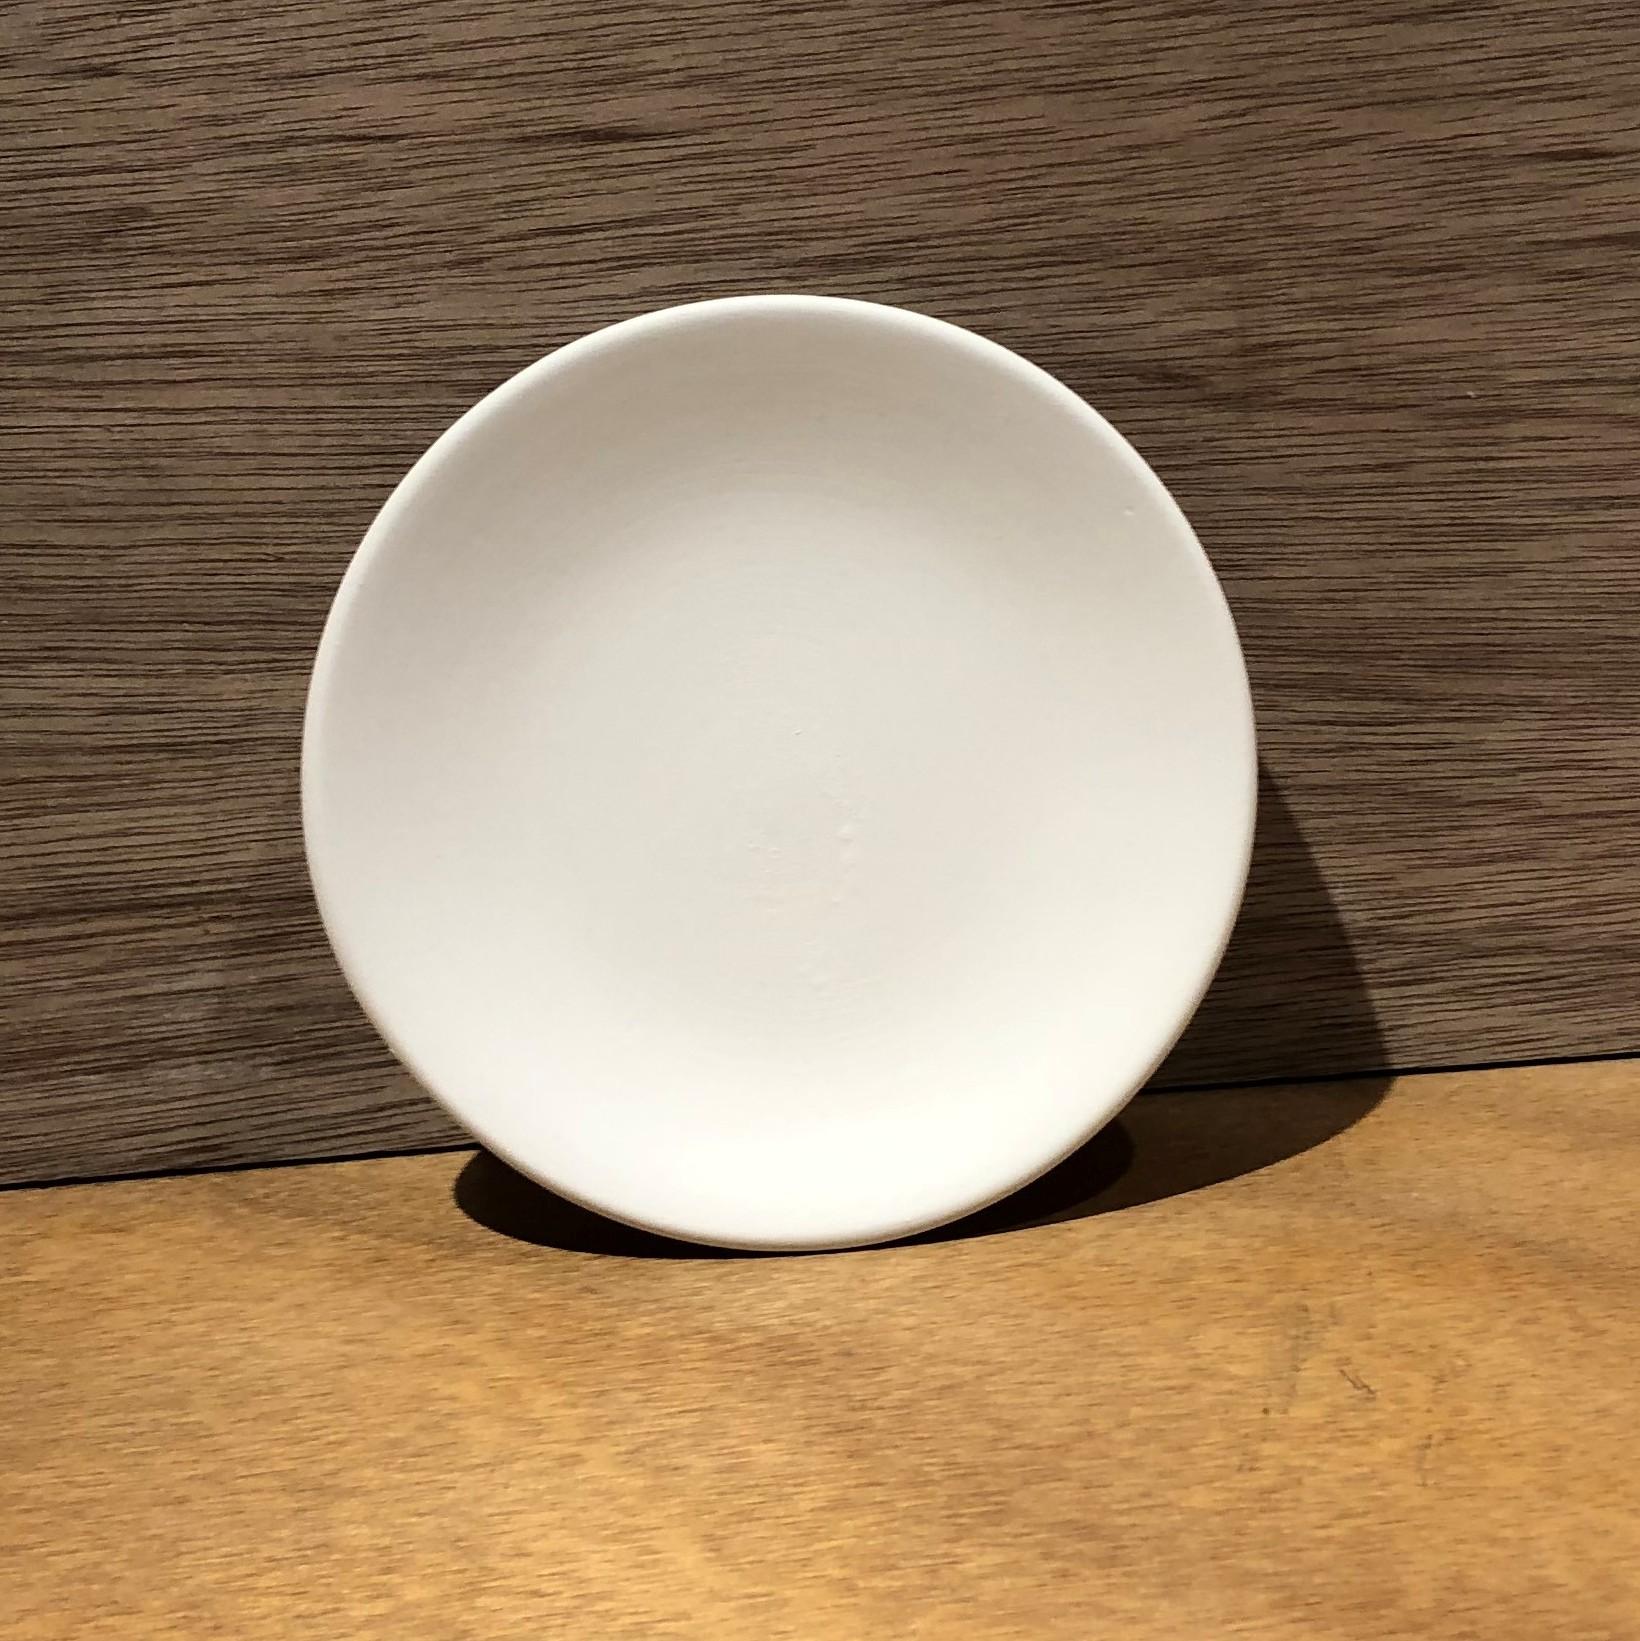 Bregentved, 14 cm